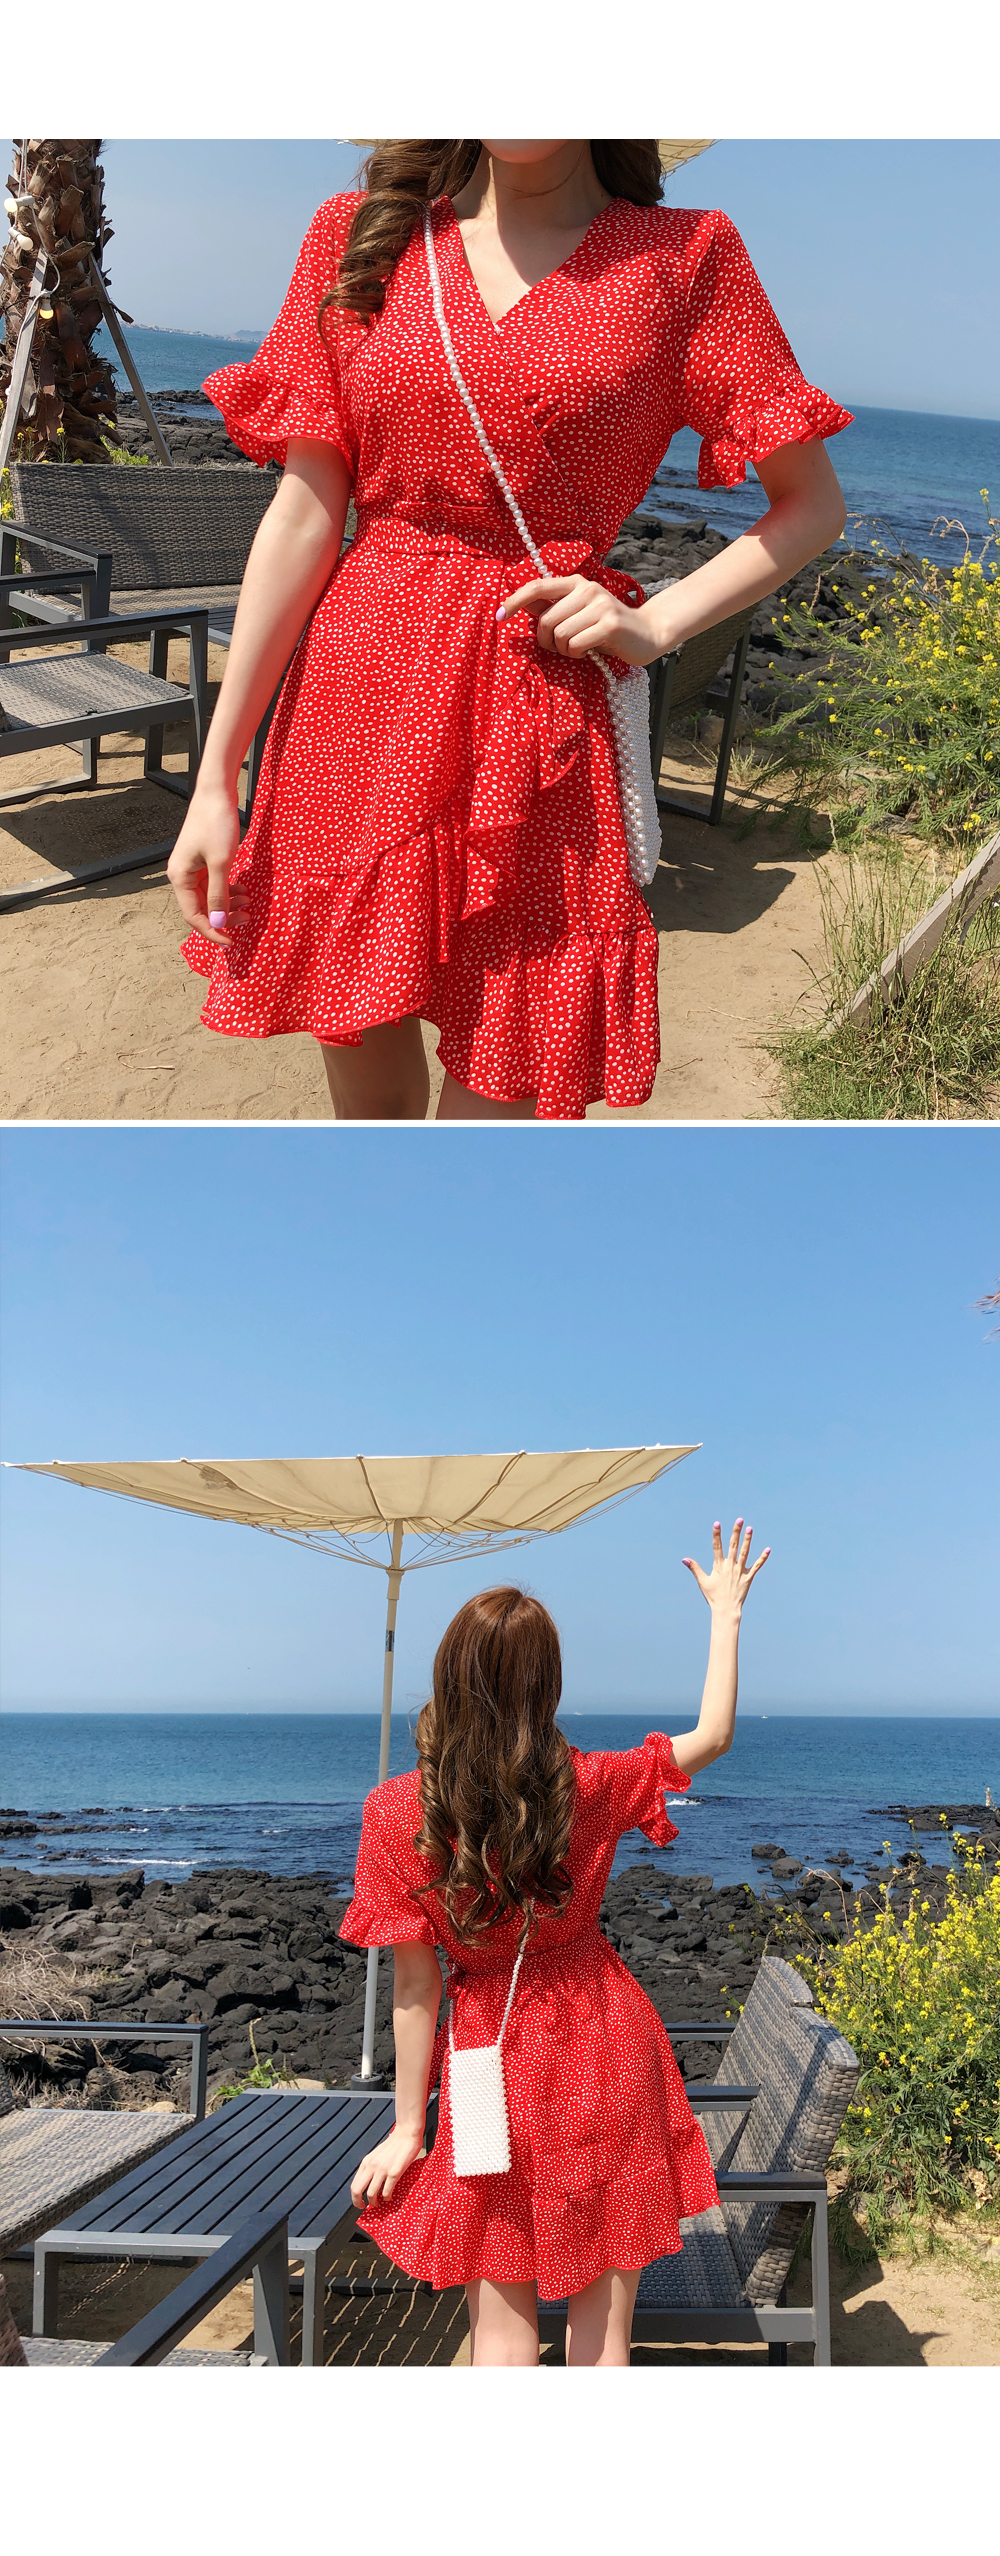 Frilly lapdot dress